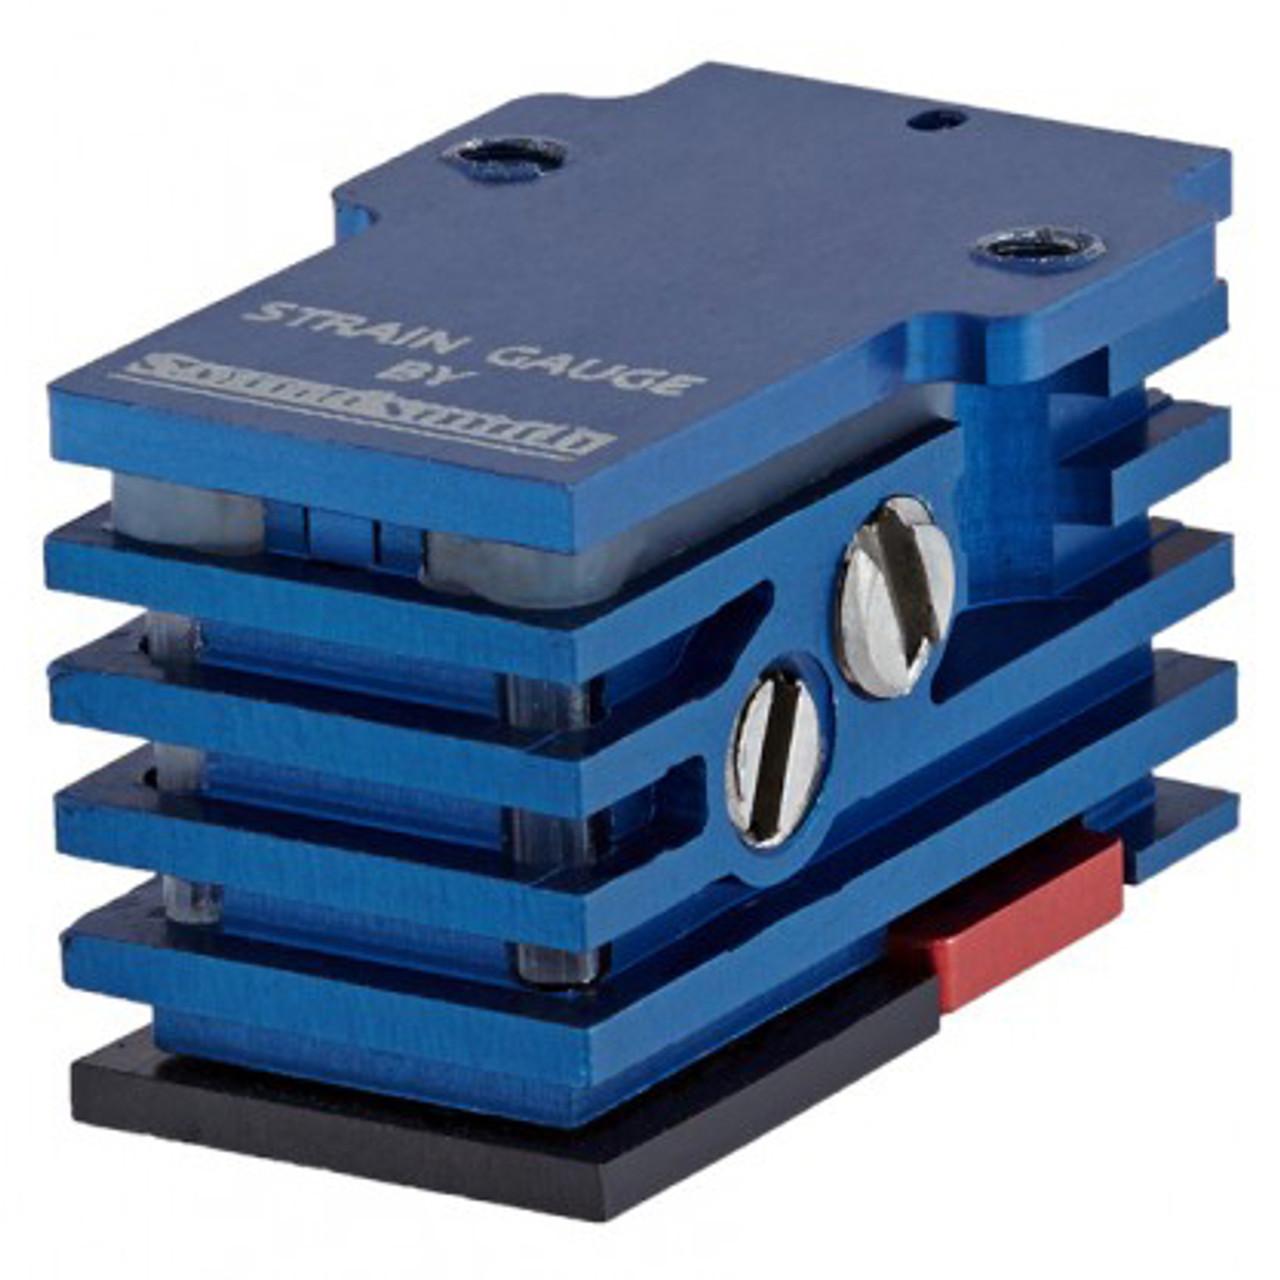 Soundsmith Strain Gauge SG-200 cartridge